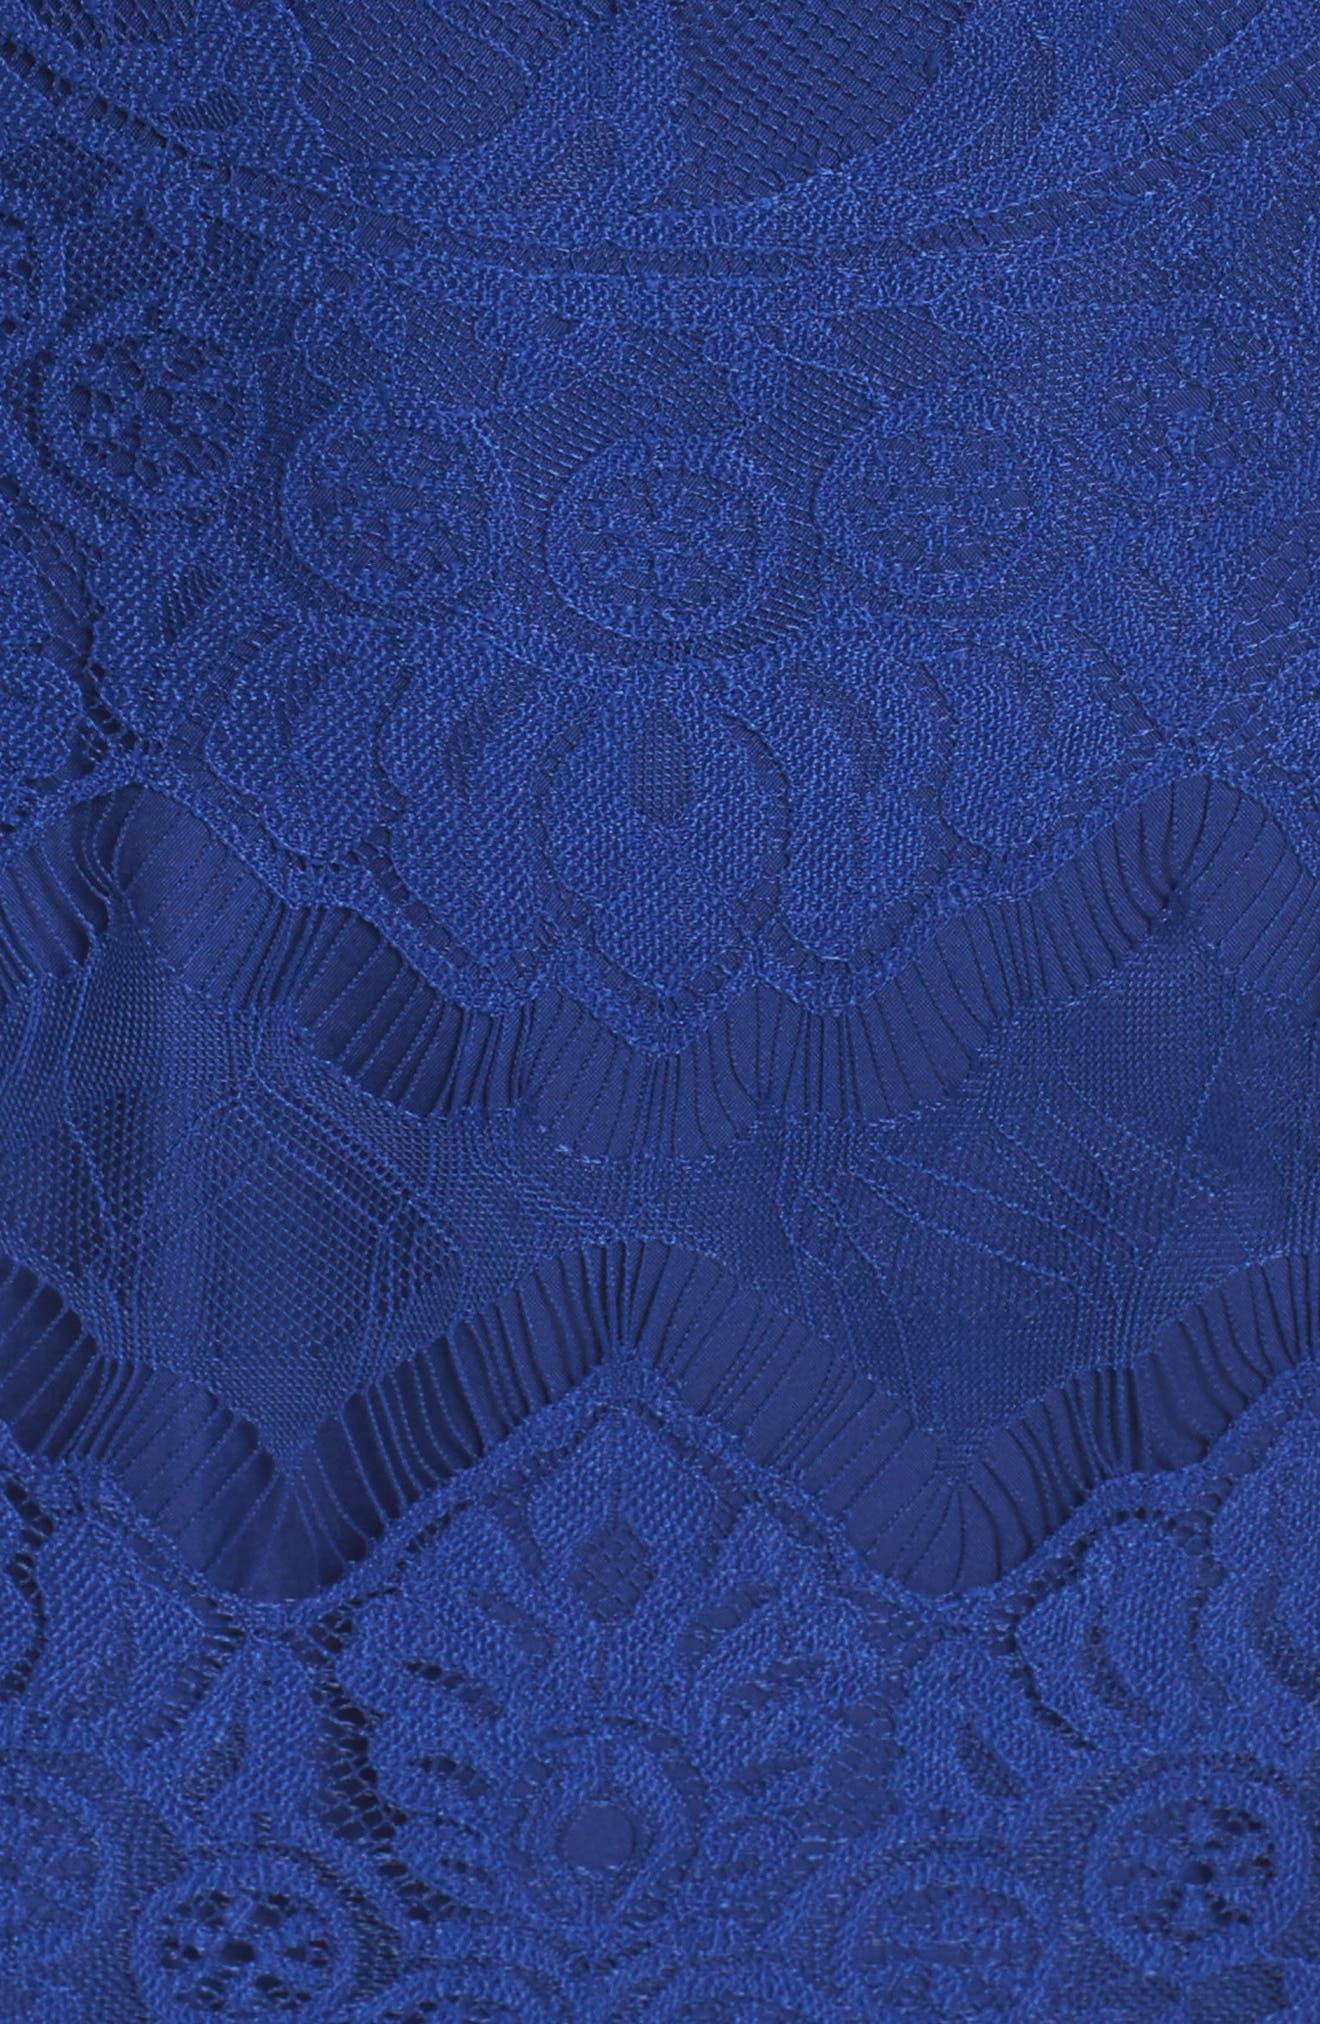 Jayce Lace Sheath Dress,                             Alternate thumbnail 5, color,                             Sapphire